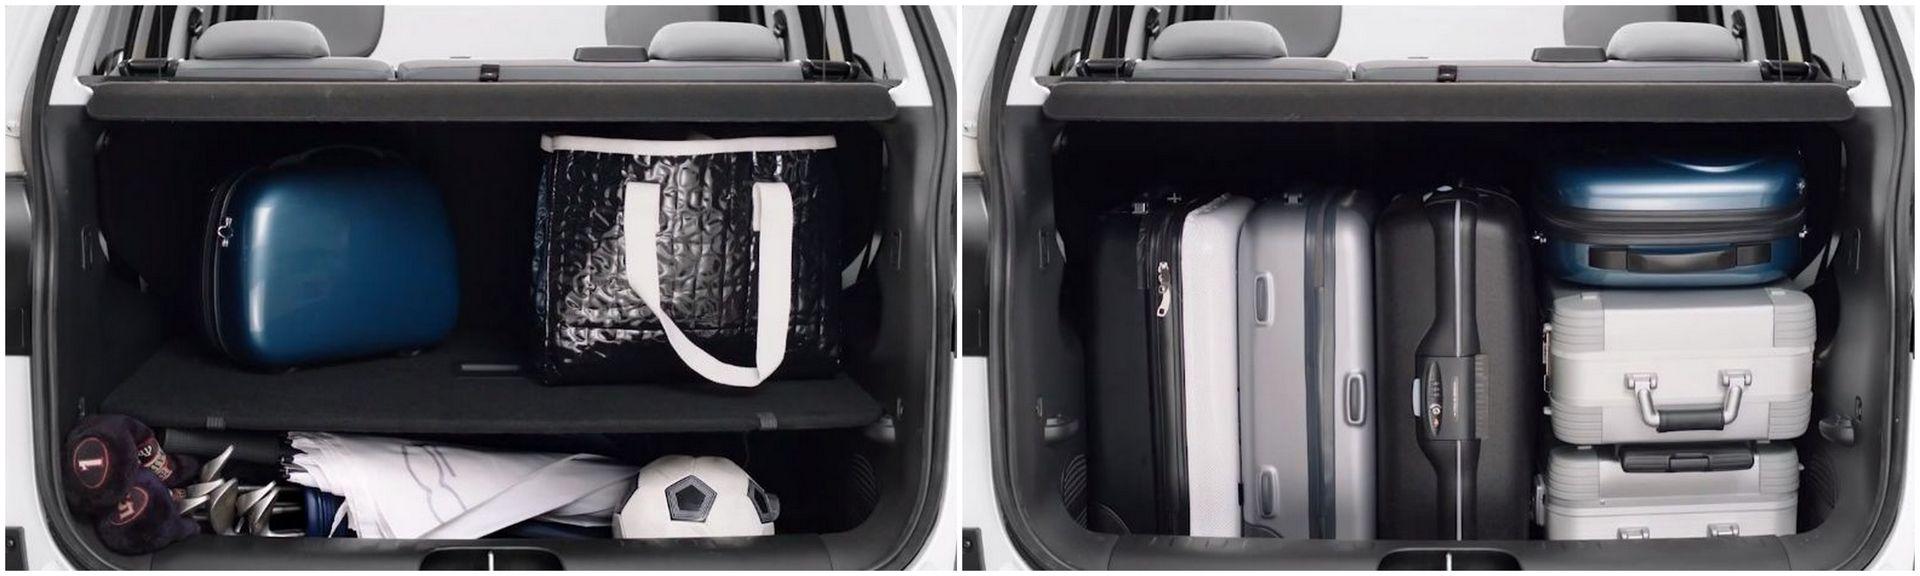 FIAT 000L — багажник, фотоколлаж